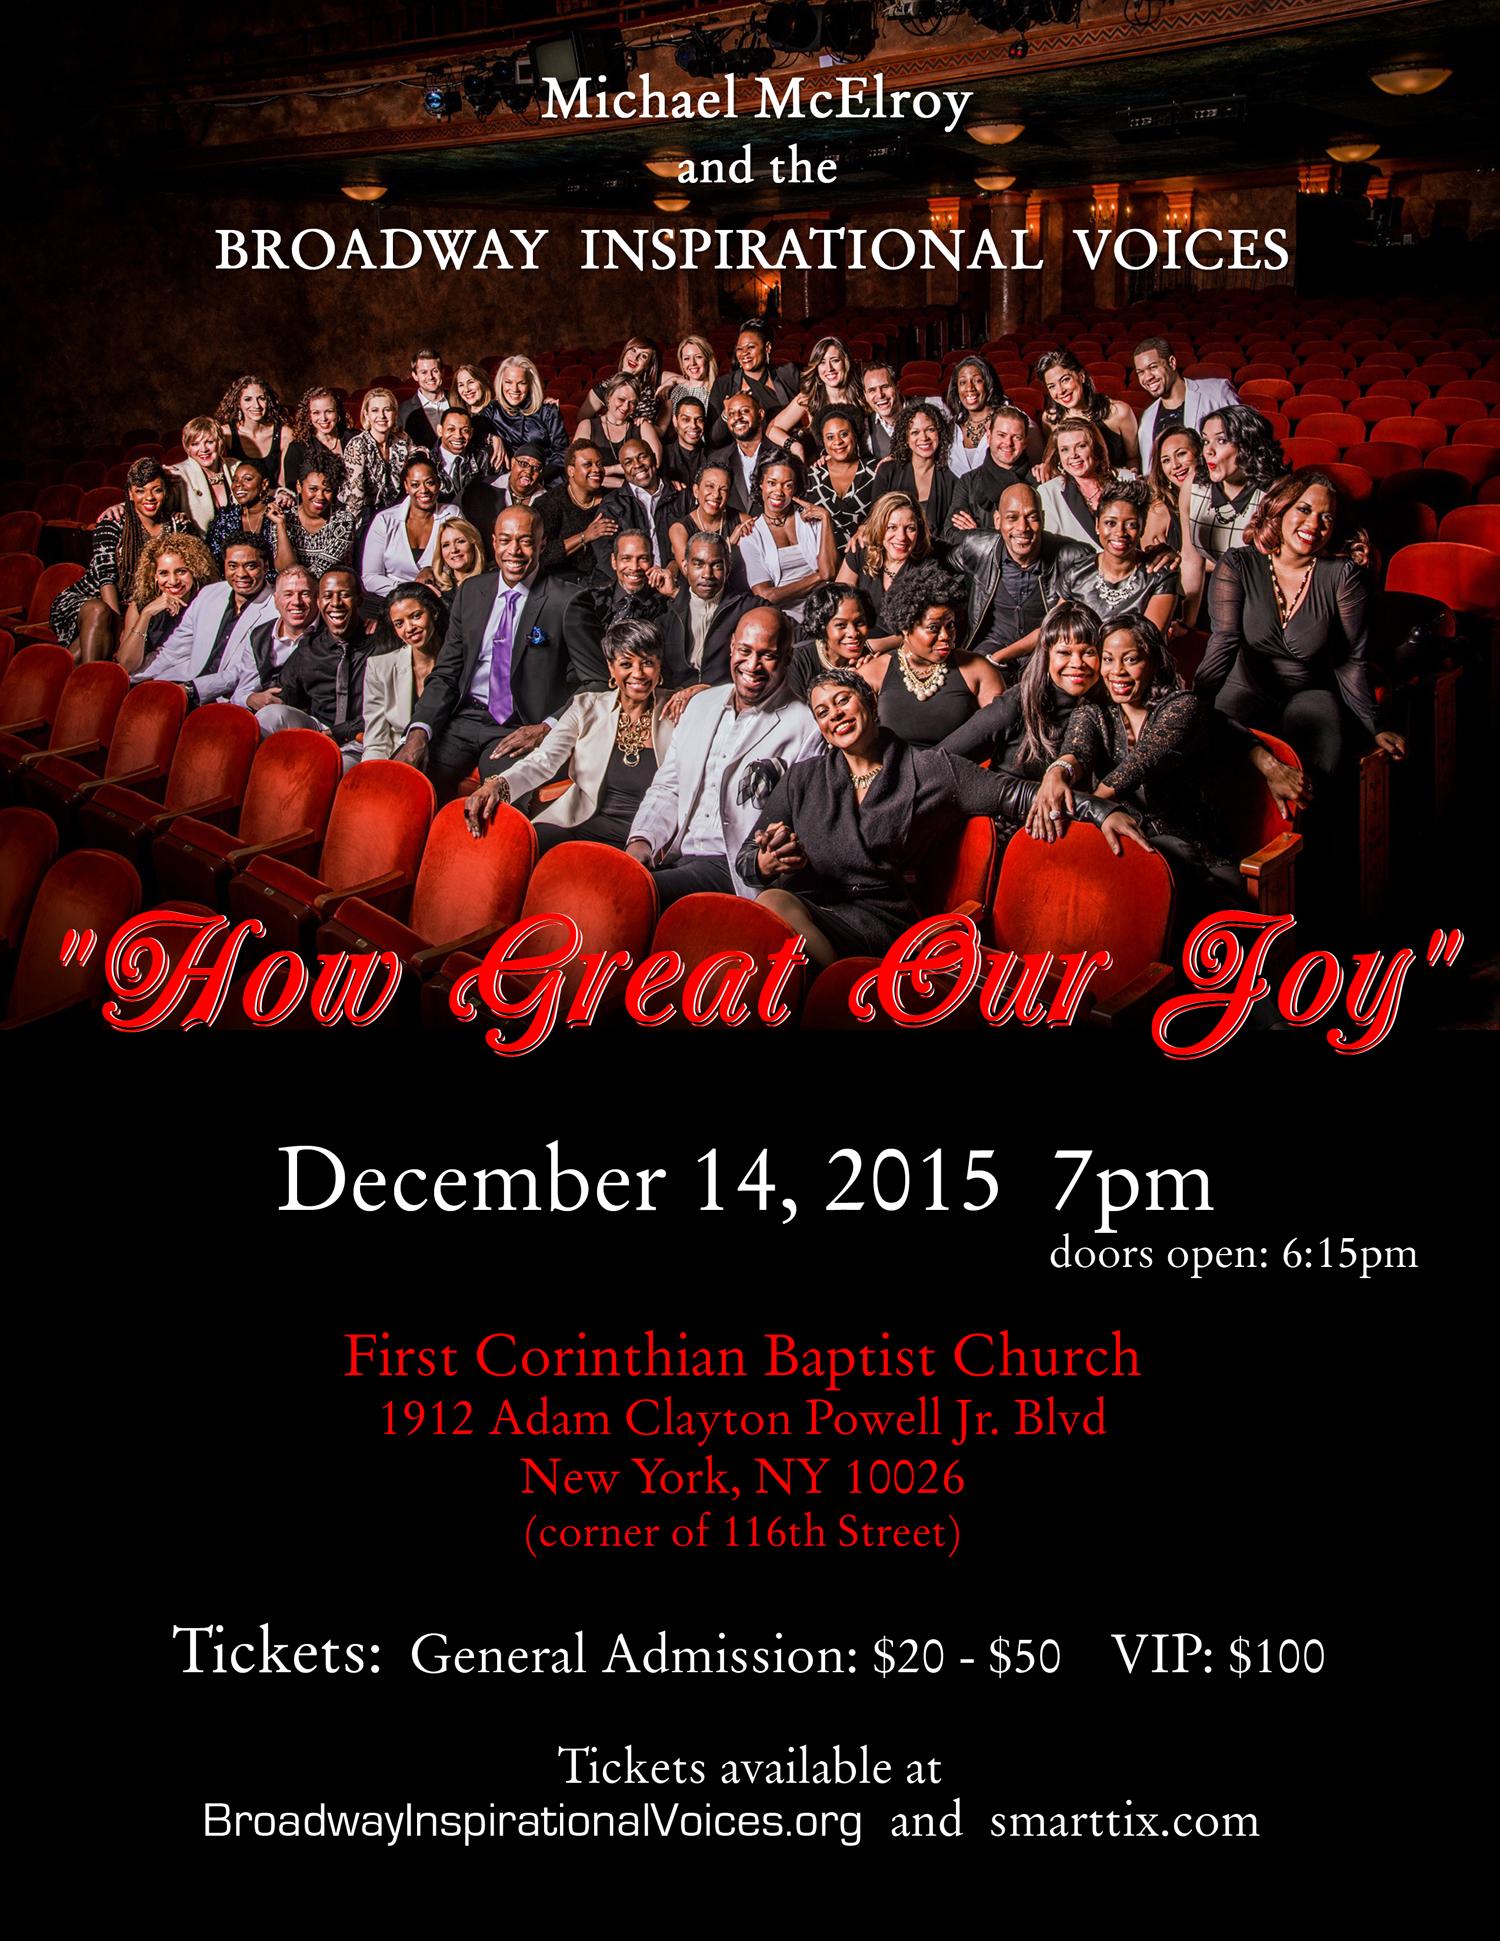 How Great Our Joy Flyer (1500x1941).jpg